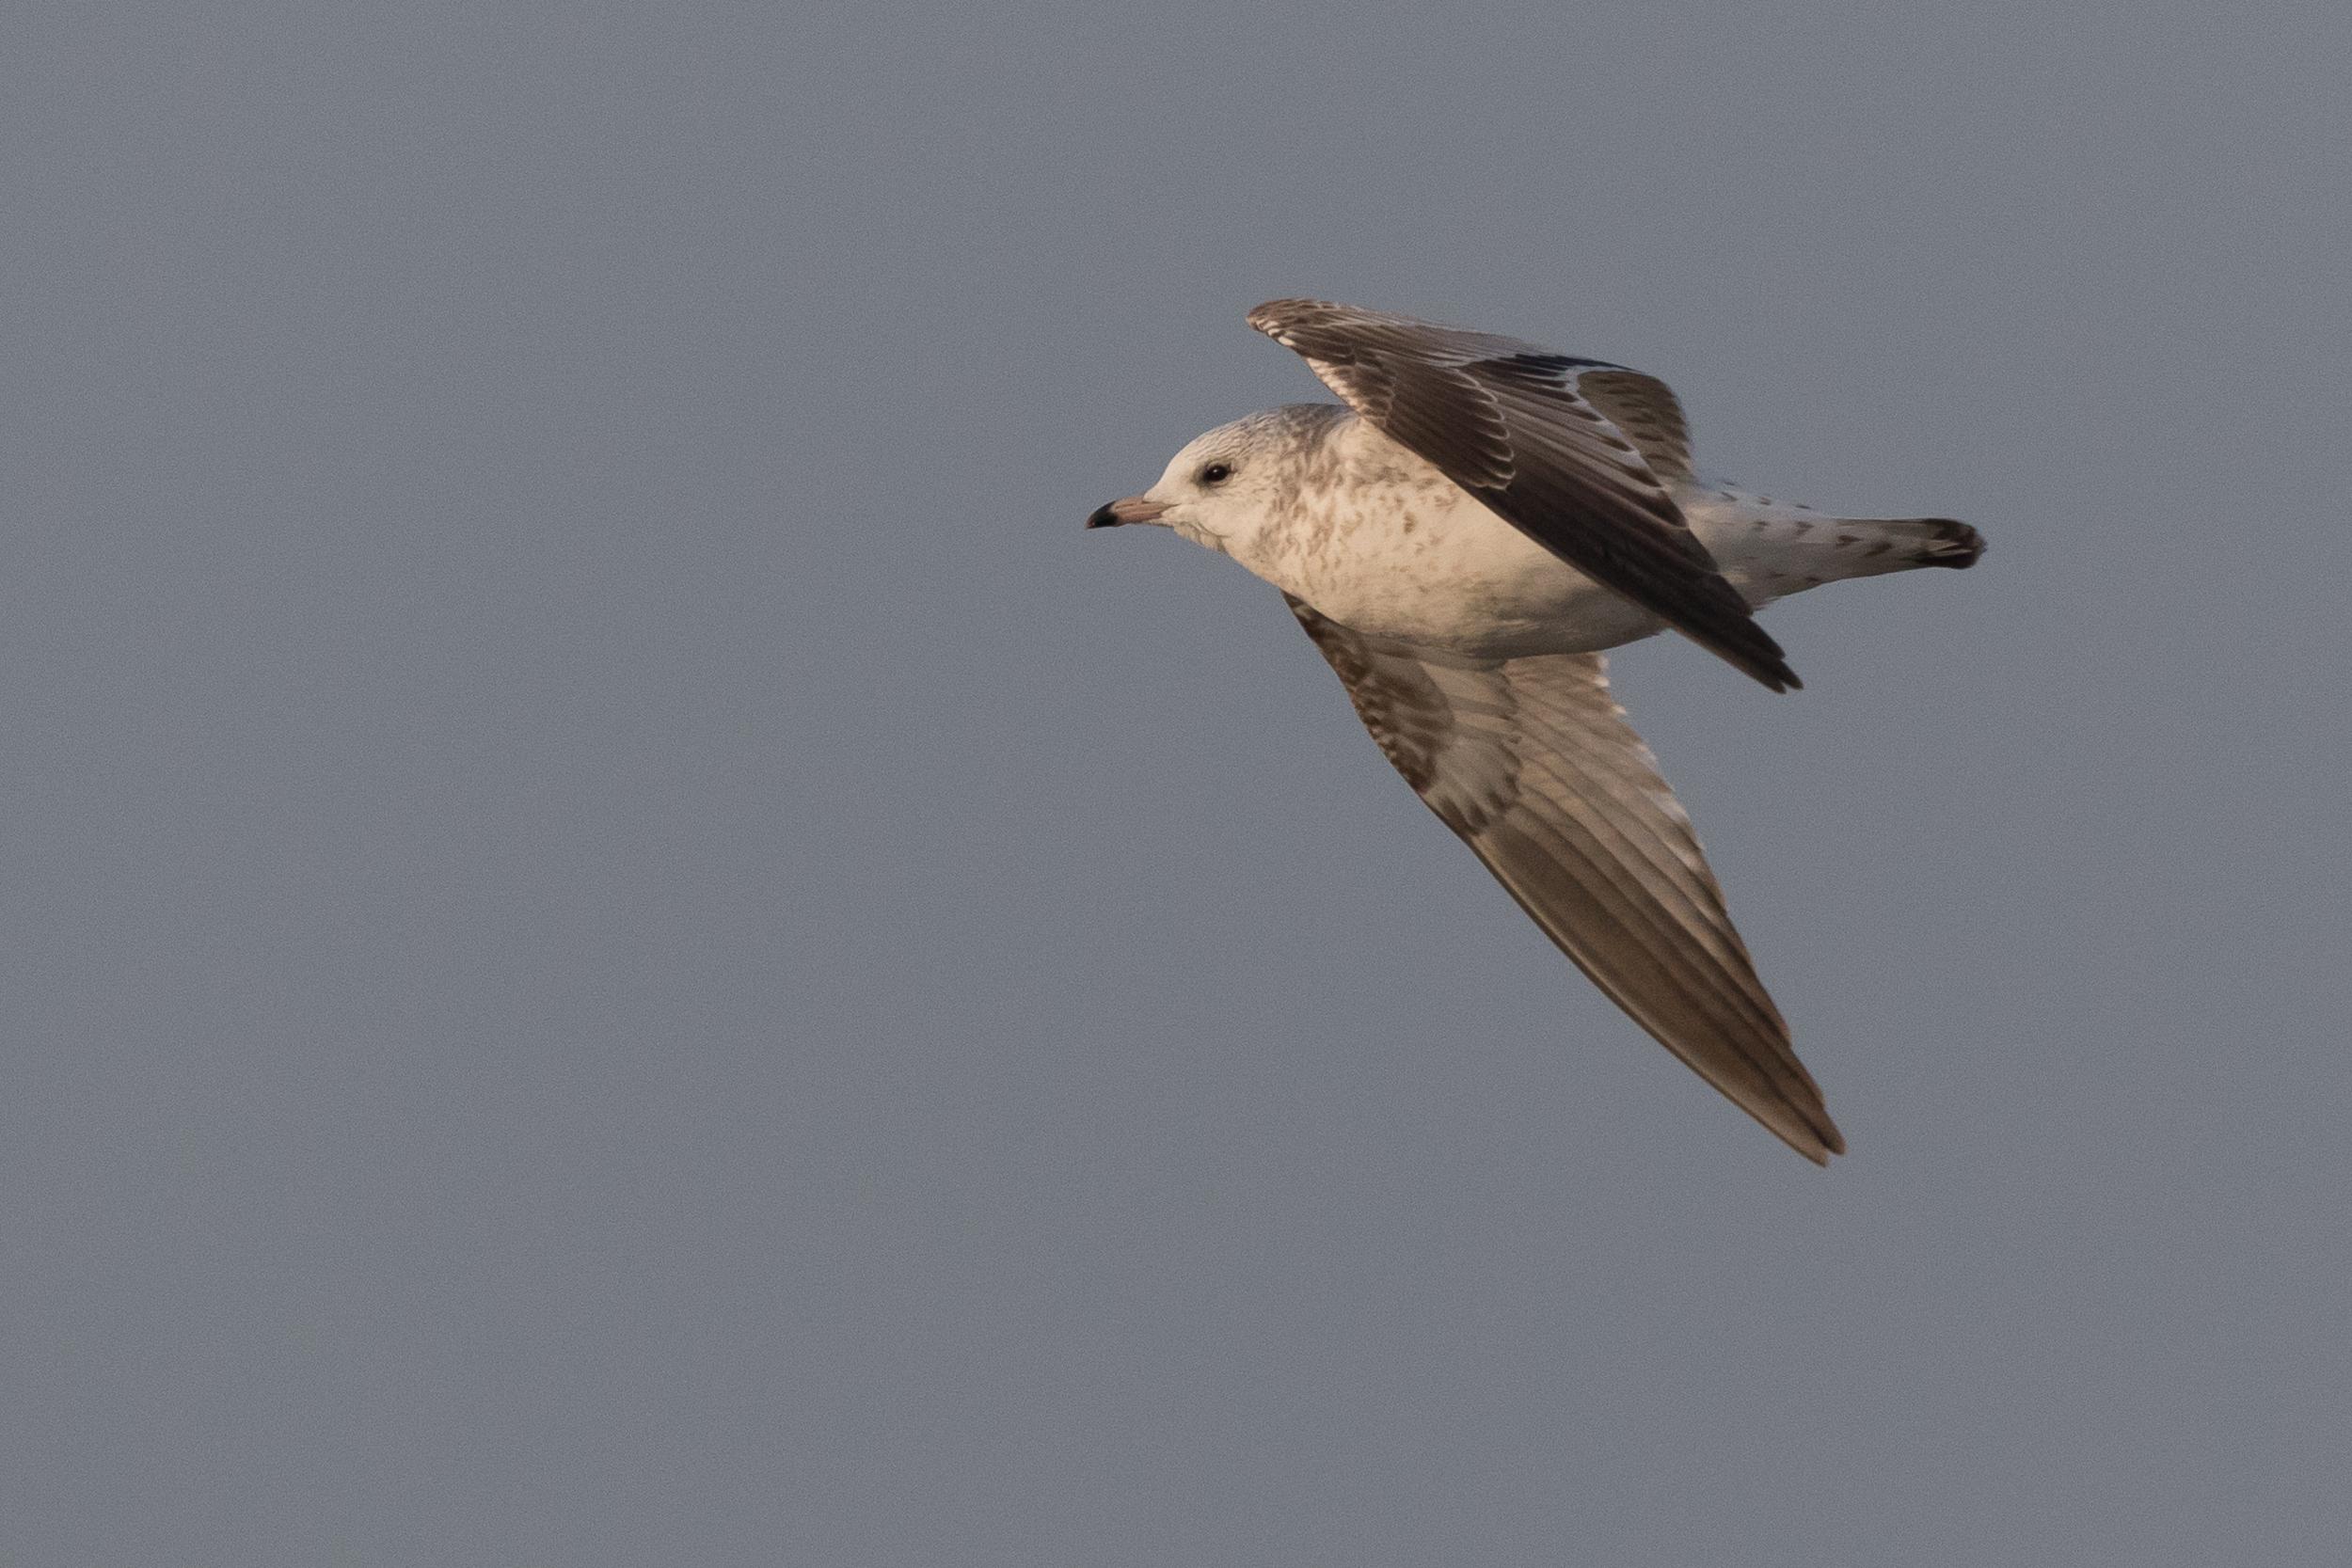 20170126-Common Gull 2CY-36.jpg